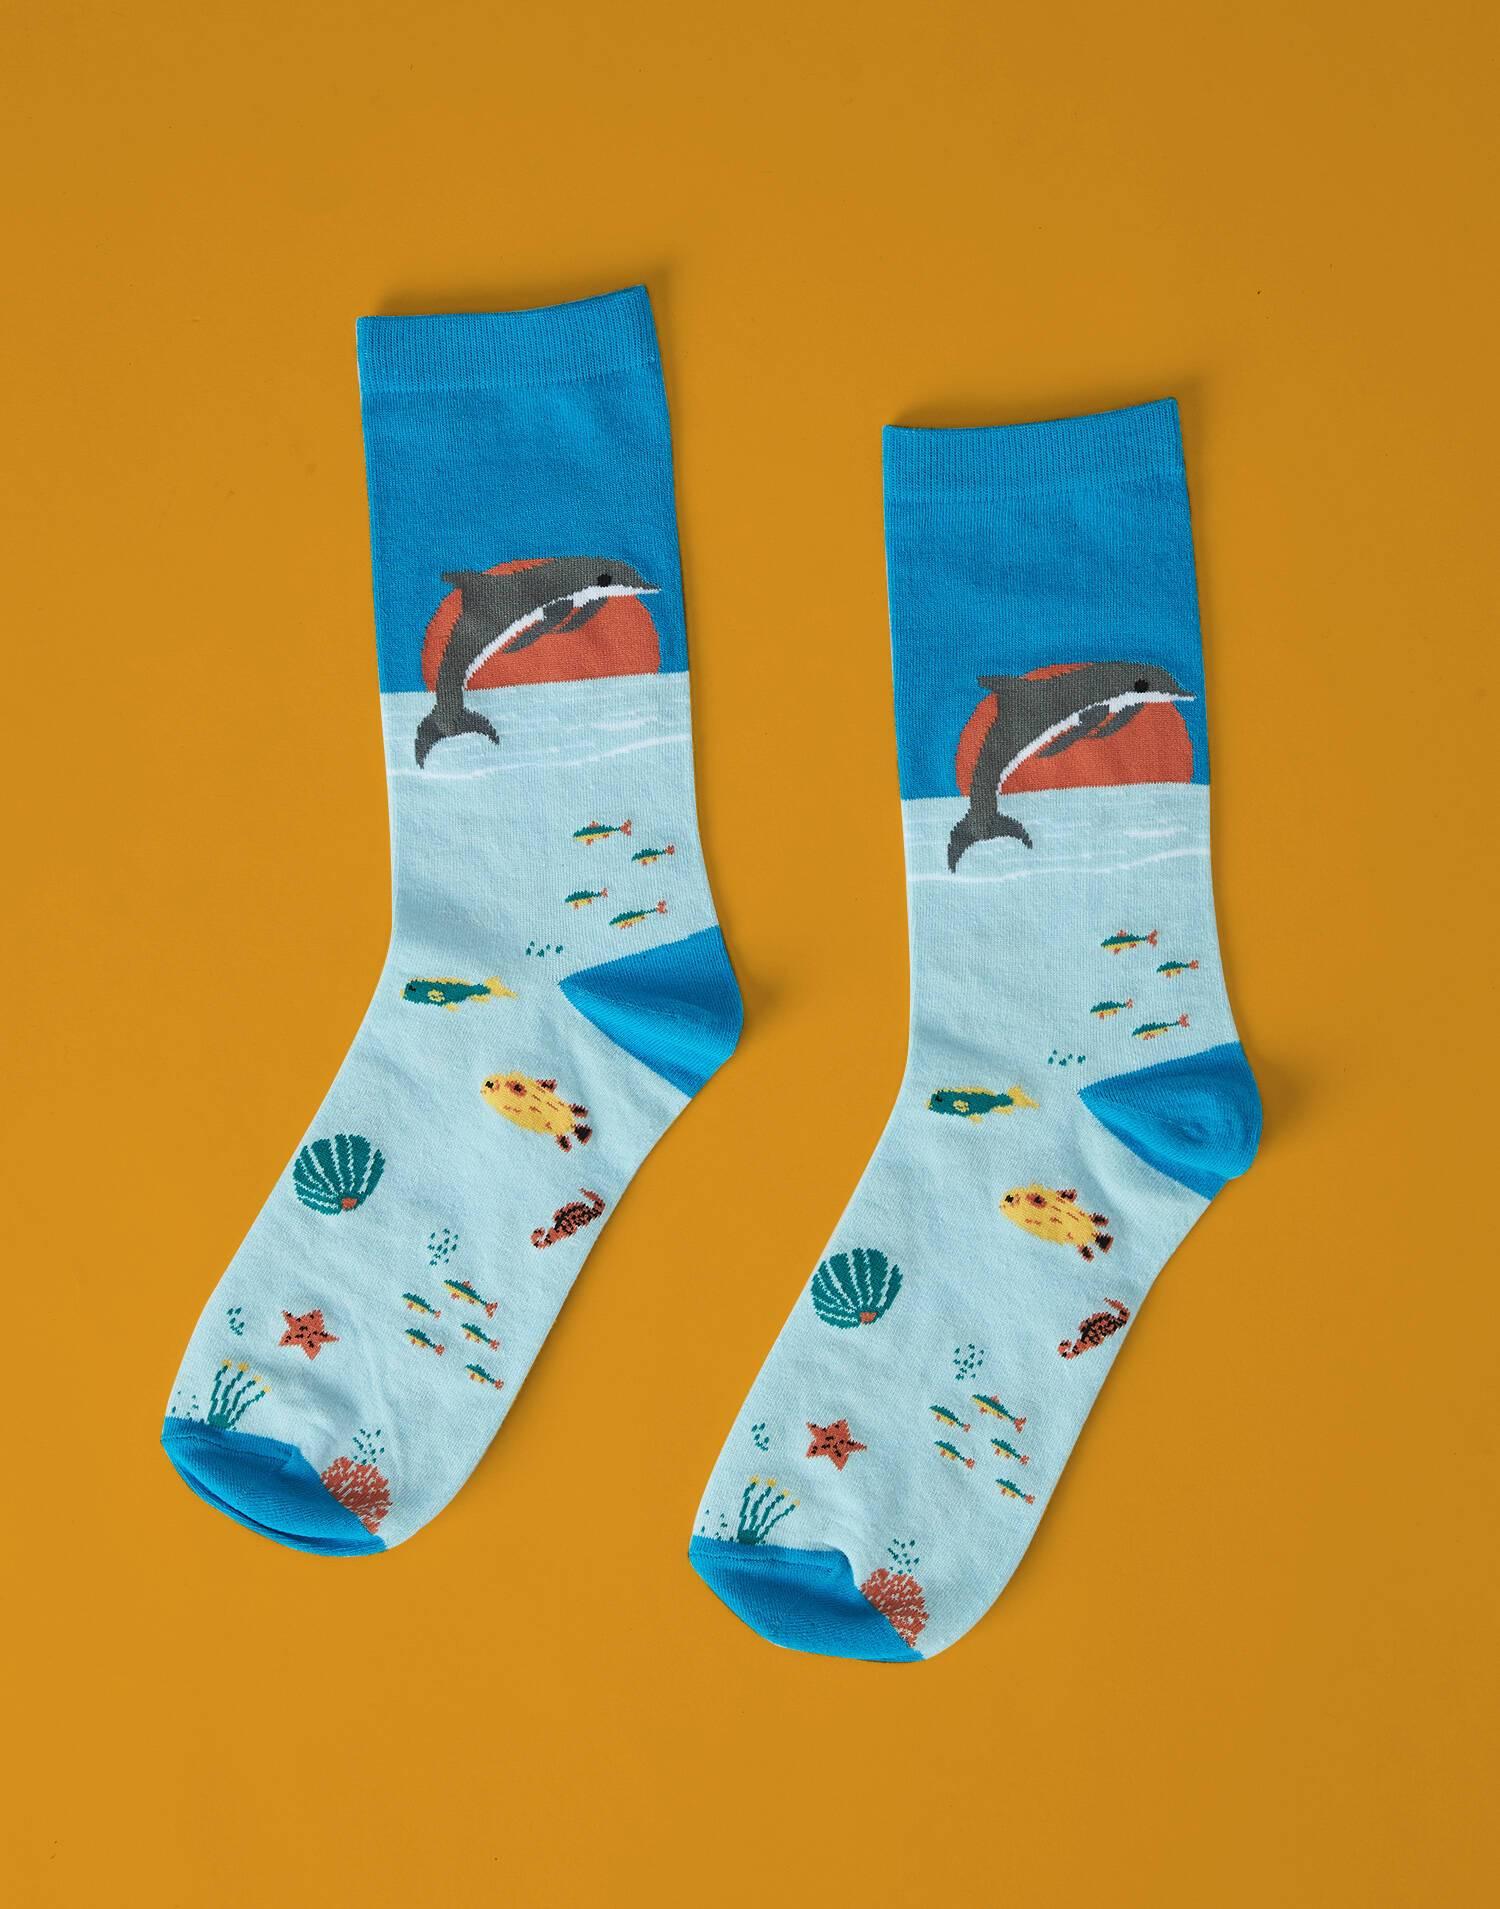 Seabed man socks